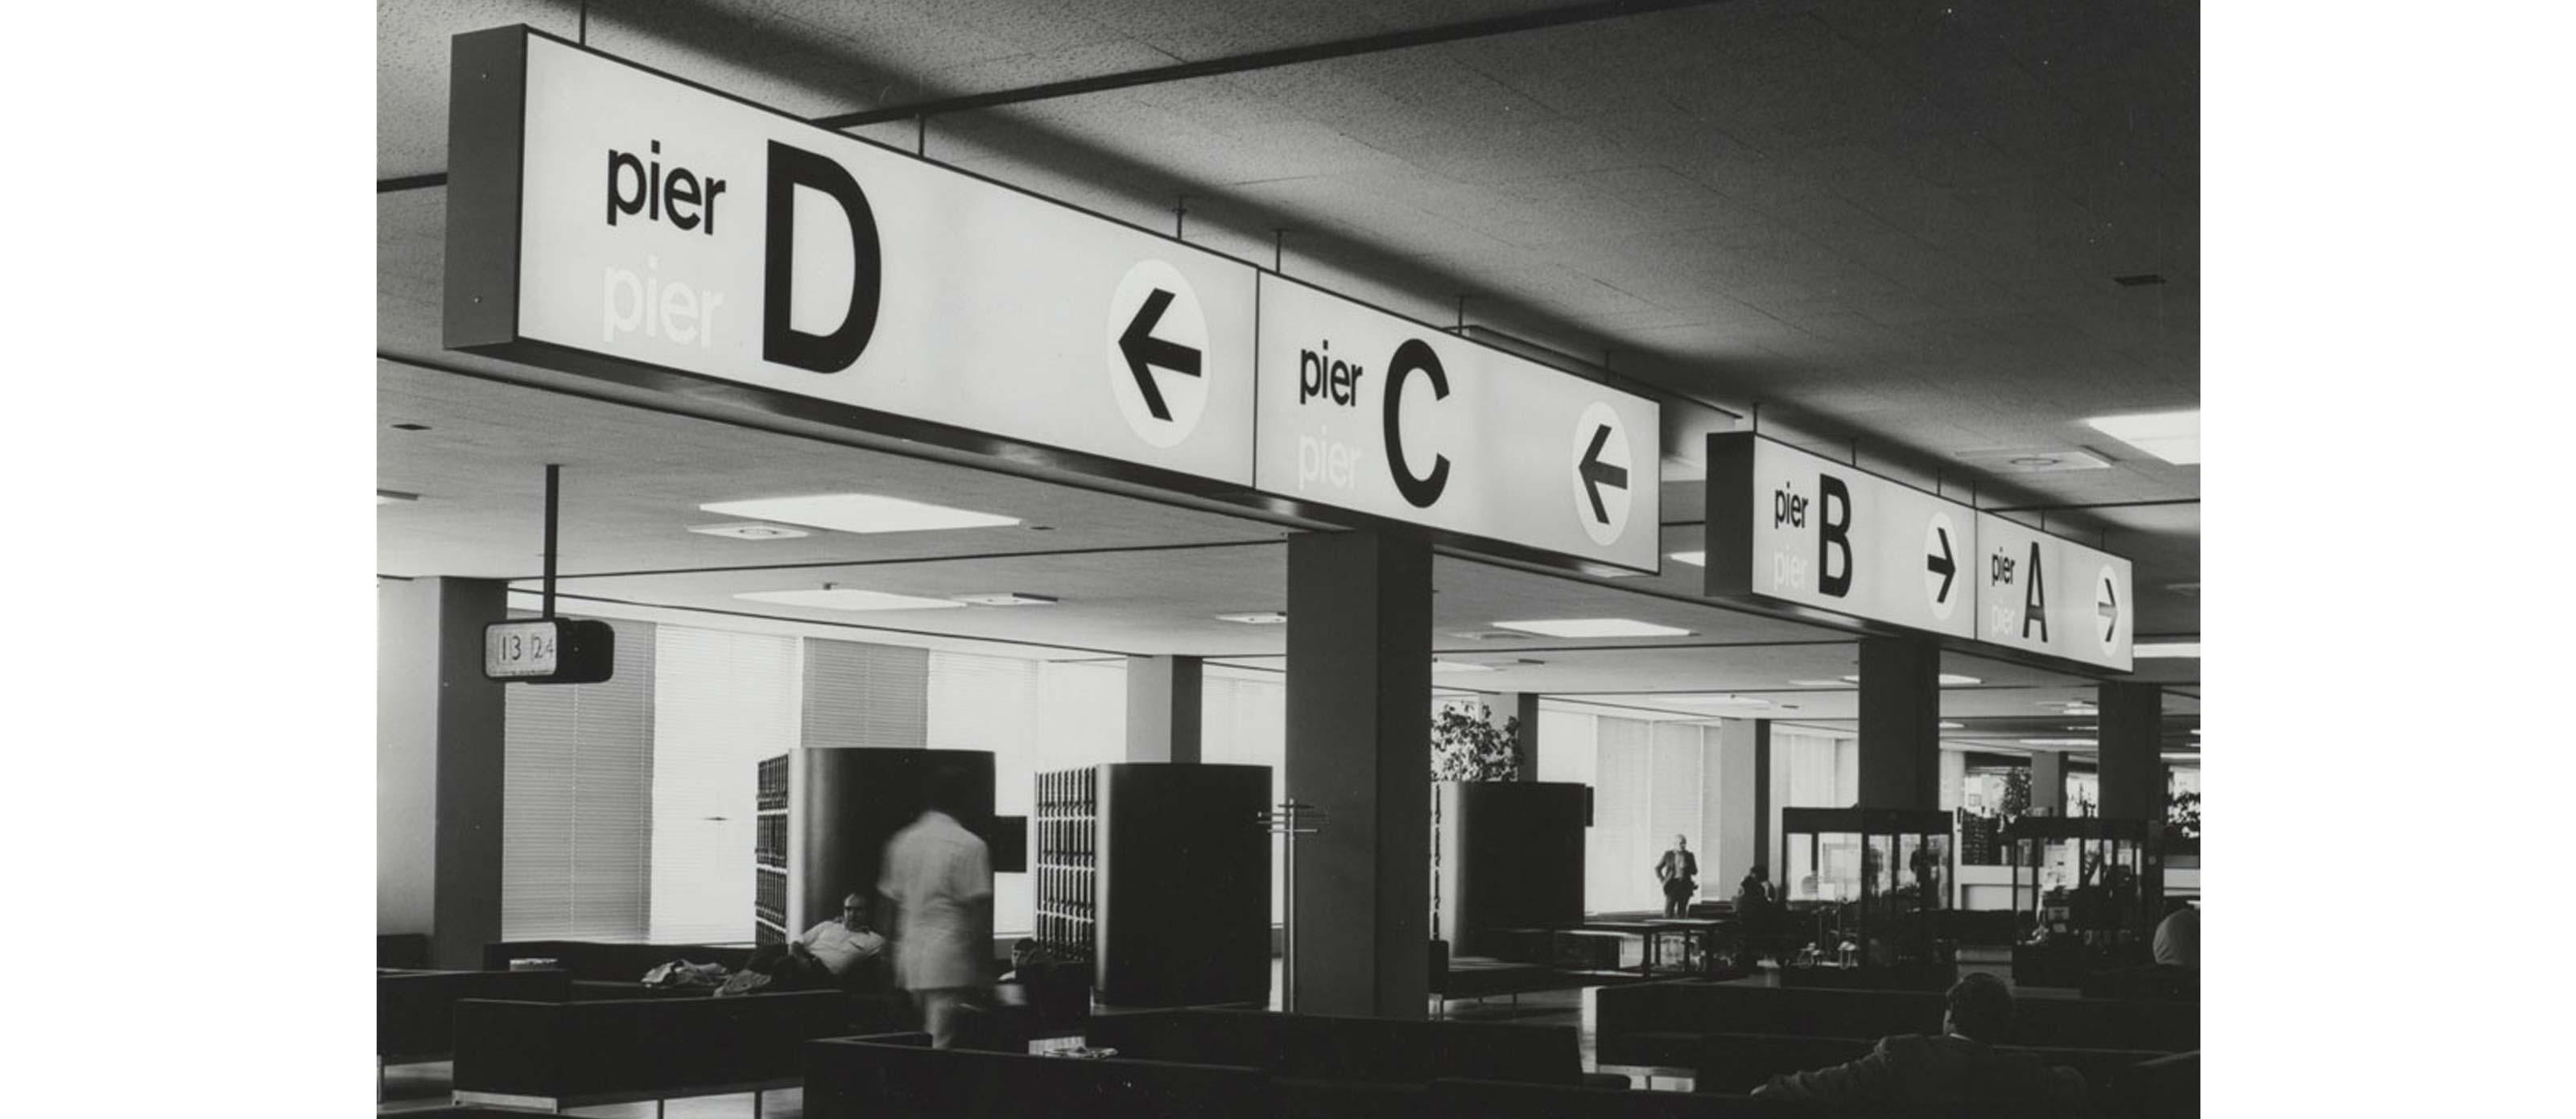 benno-wissing-signaletique-aeroport-schiphol-1967-02